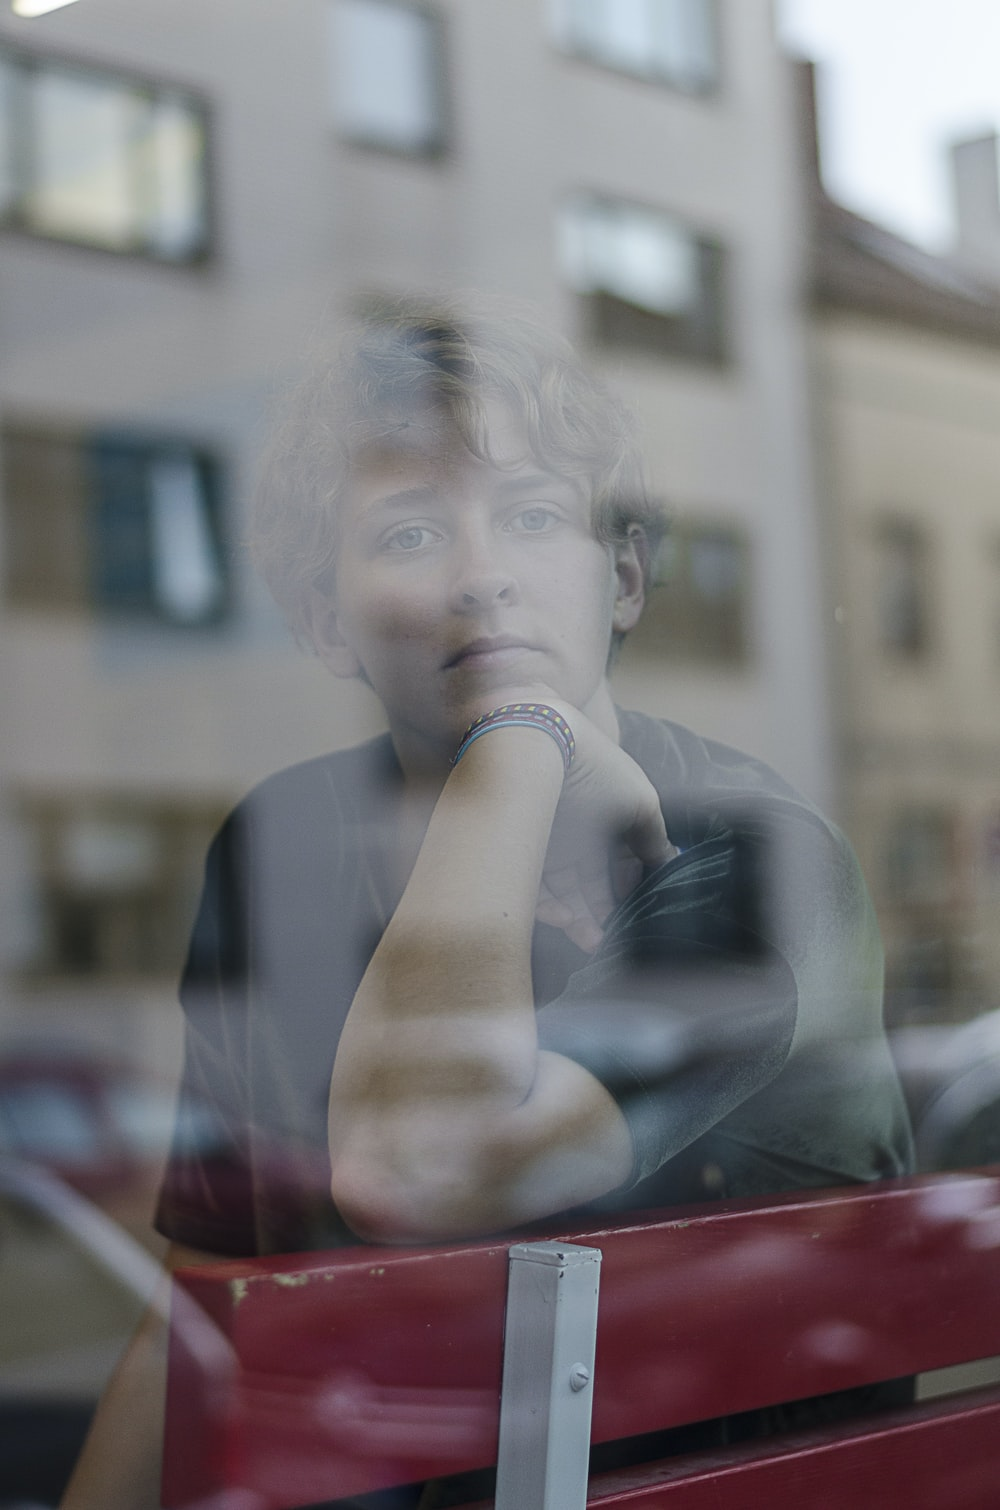 man sitting beside glass window